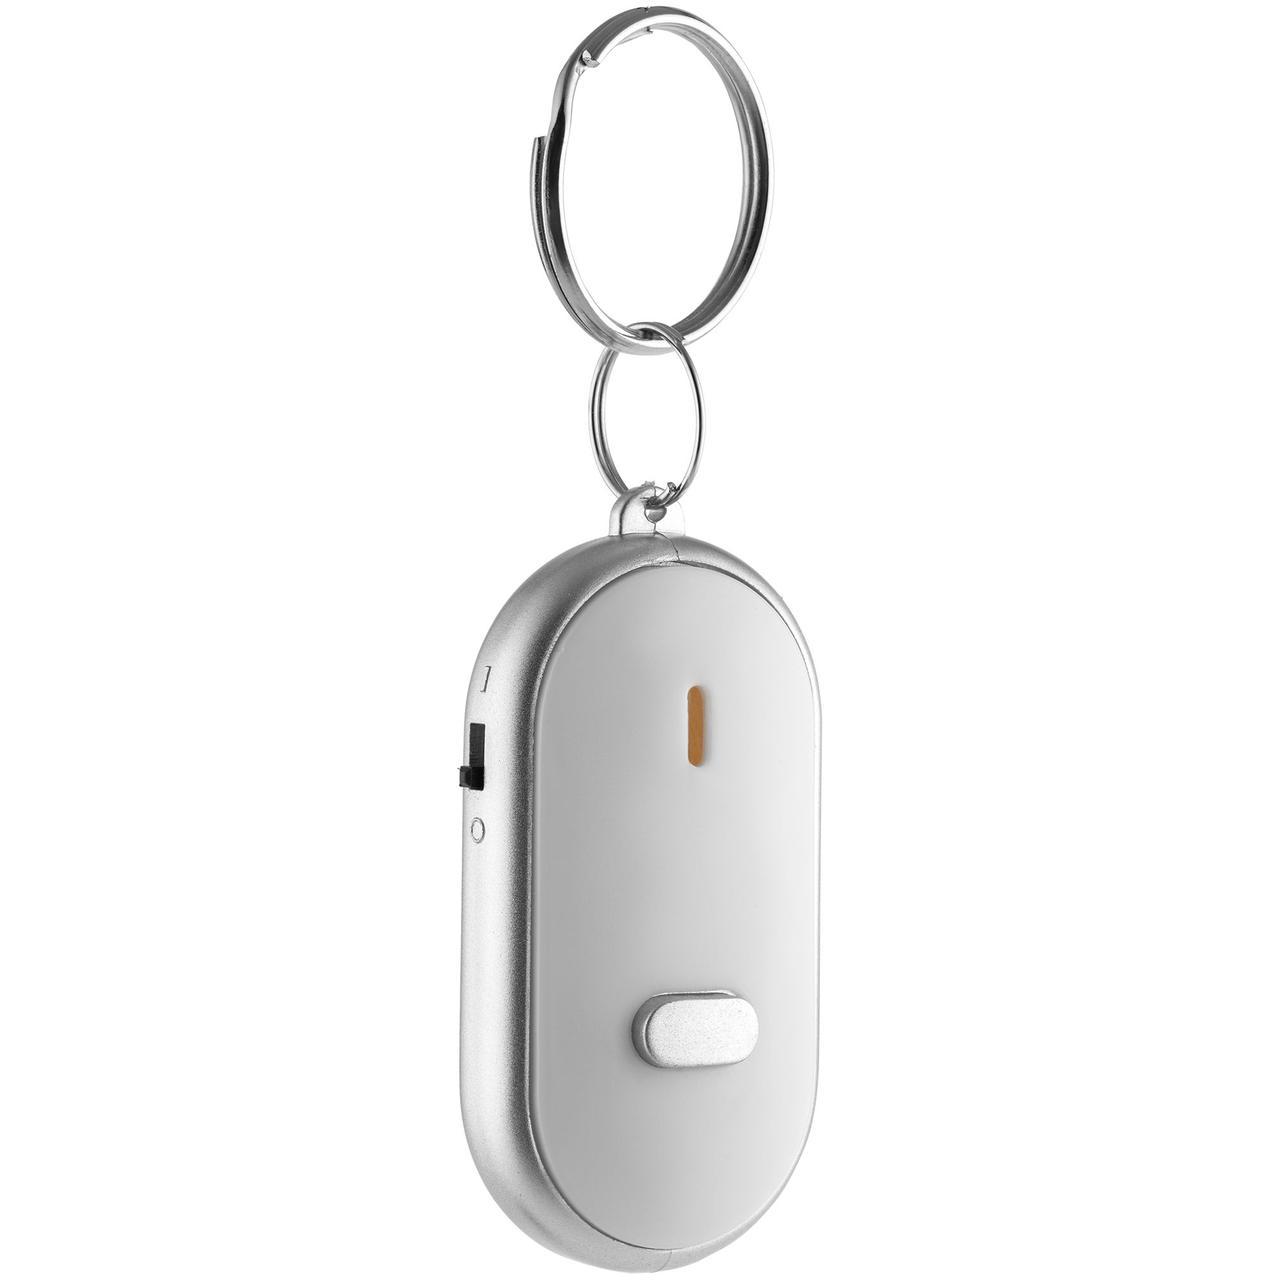 Брелок для поиска ключей Signalet, белый (артикул 10196.60)